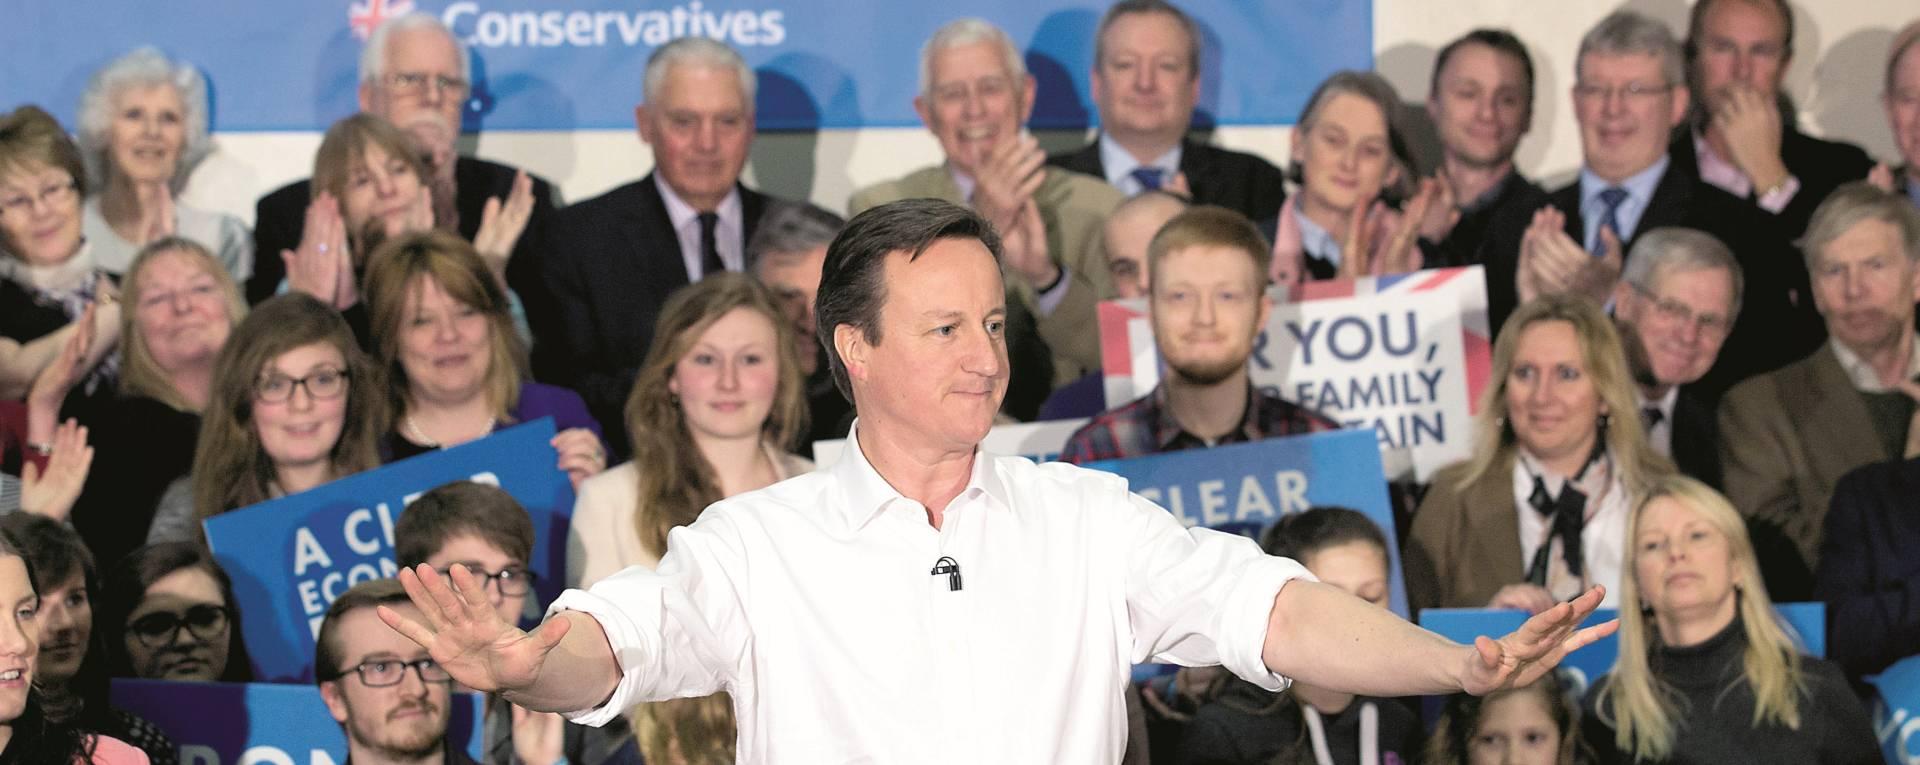 VIDEO: Poslušajmo govor britanskog premijera Davida Camerona